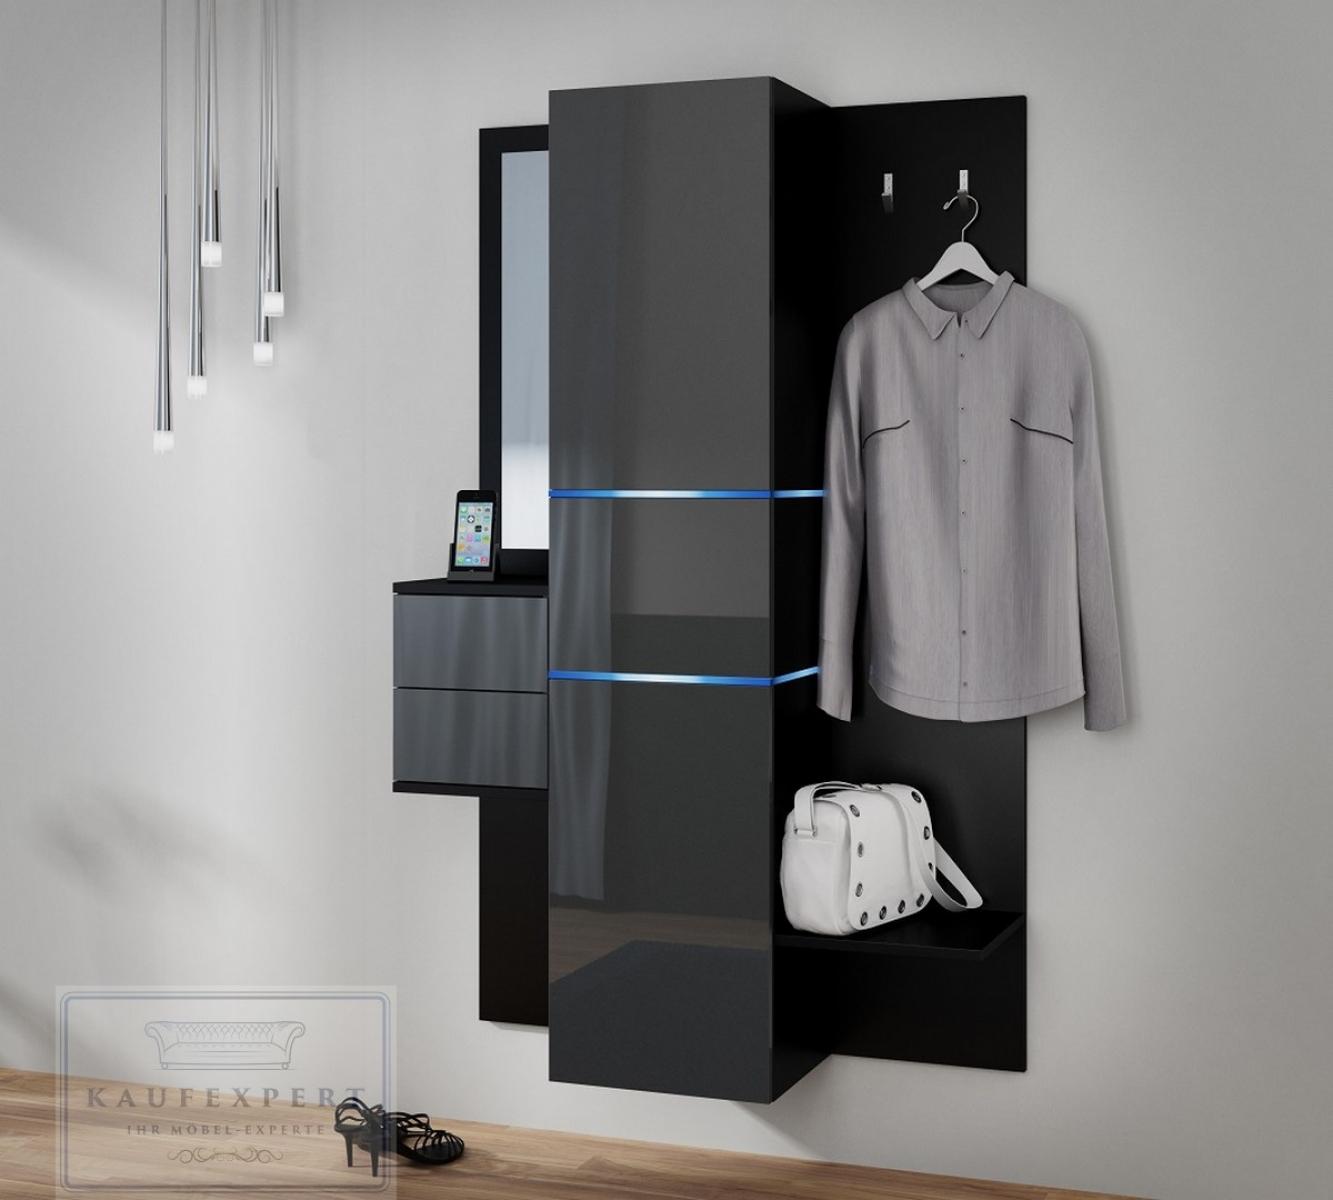 Kaufexpert garderobe camino grau hochglanz schwarz mit for Garderobe grau holz